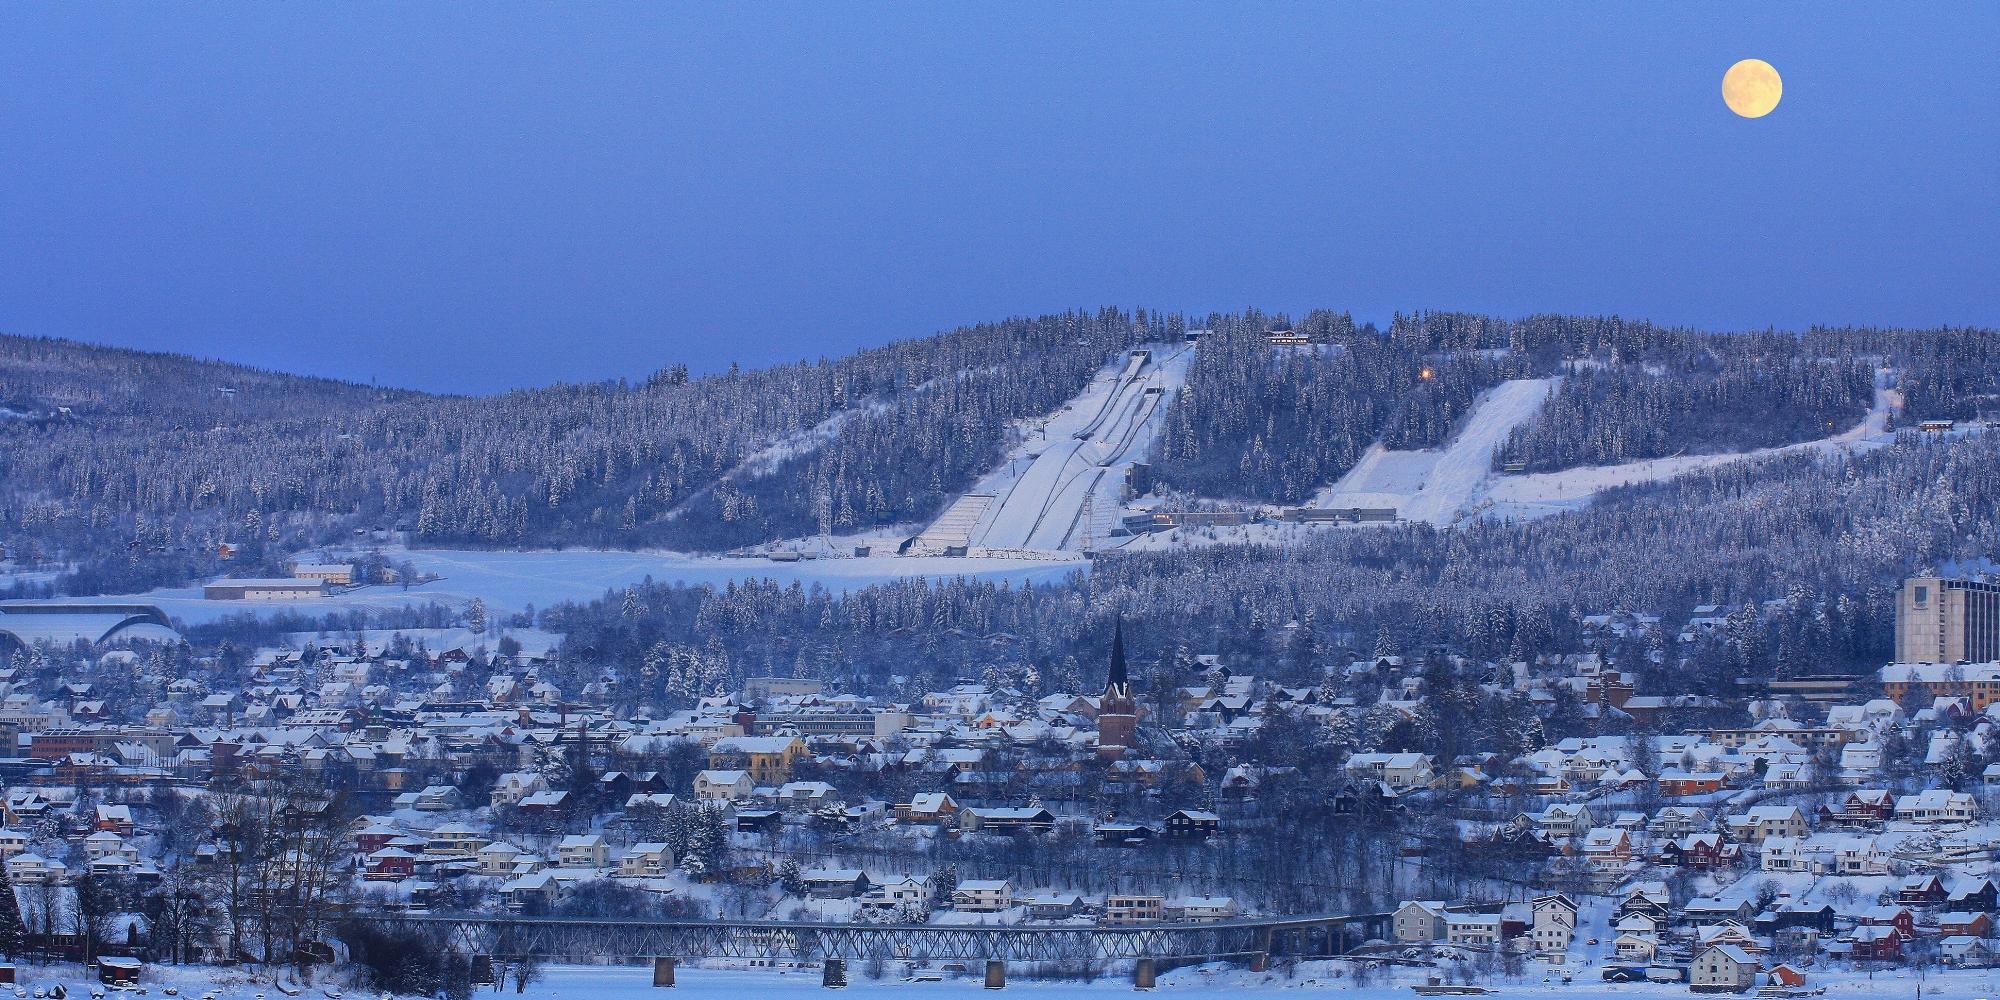 Die Region Lillehammer in Norwegen | Skifahren mit Olympia-Feeling